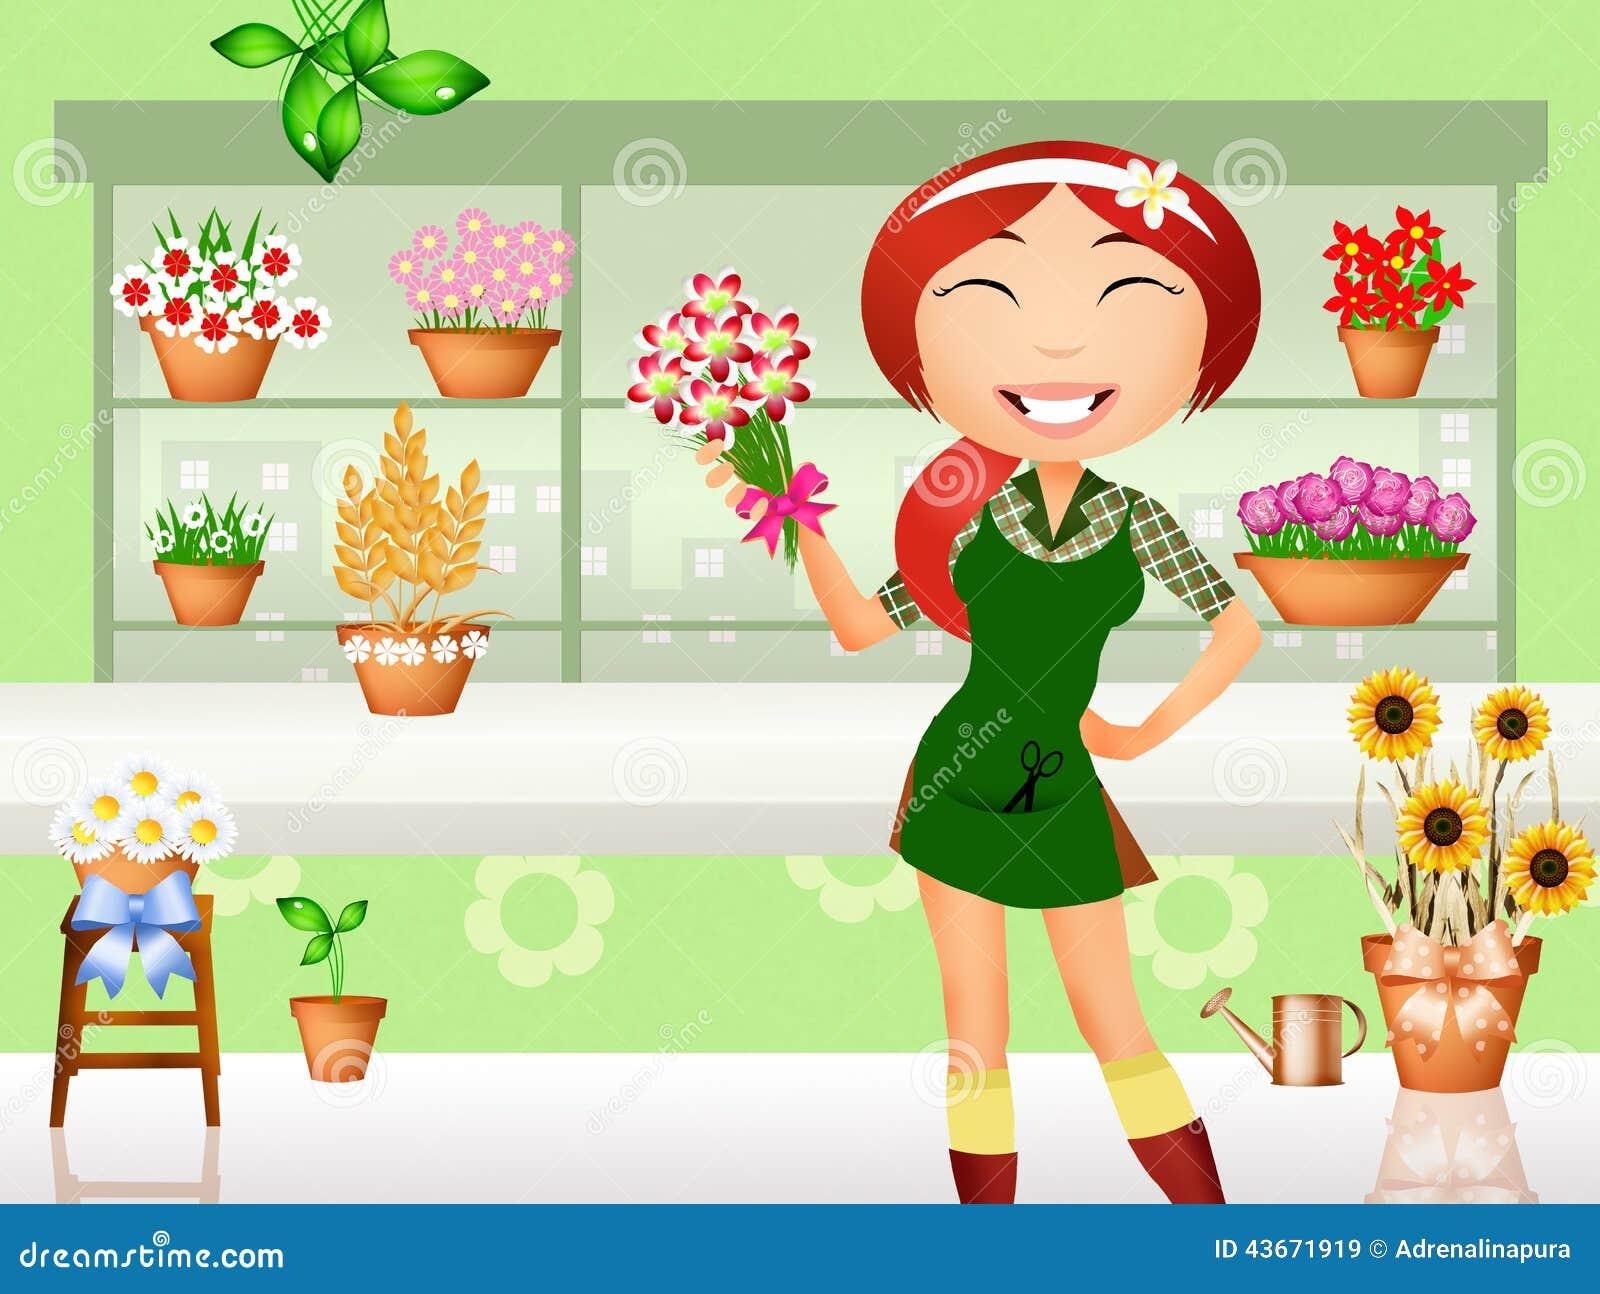 florist stock illustration image 43671919